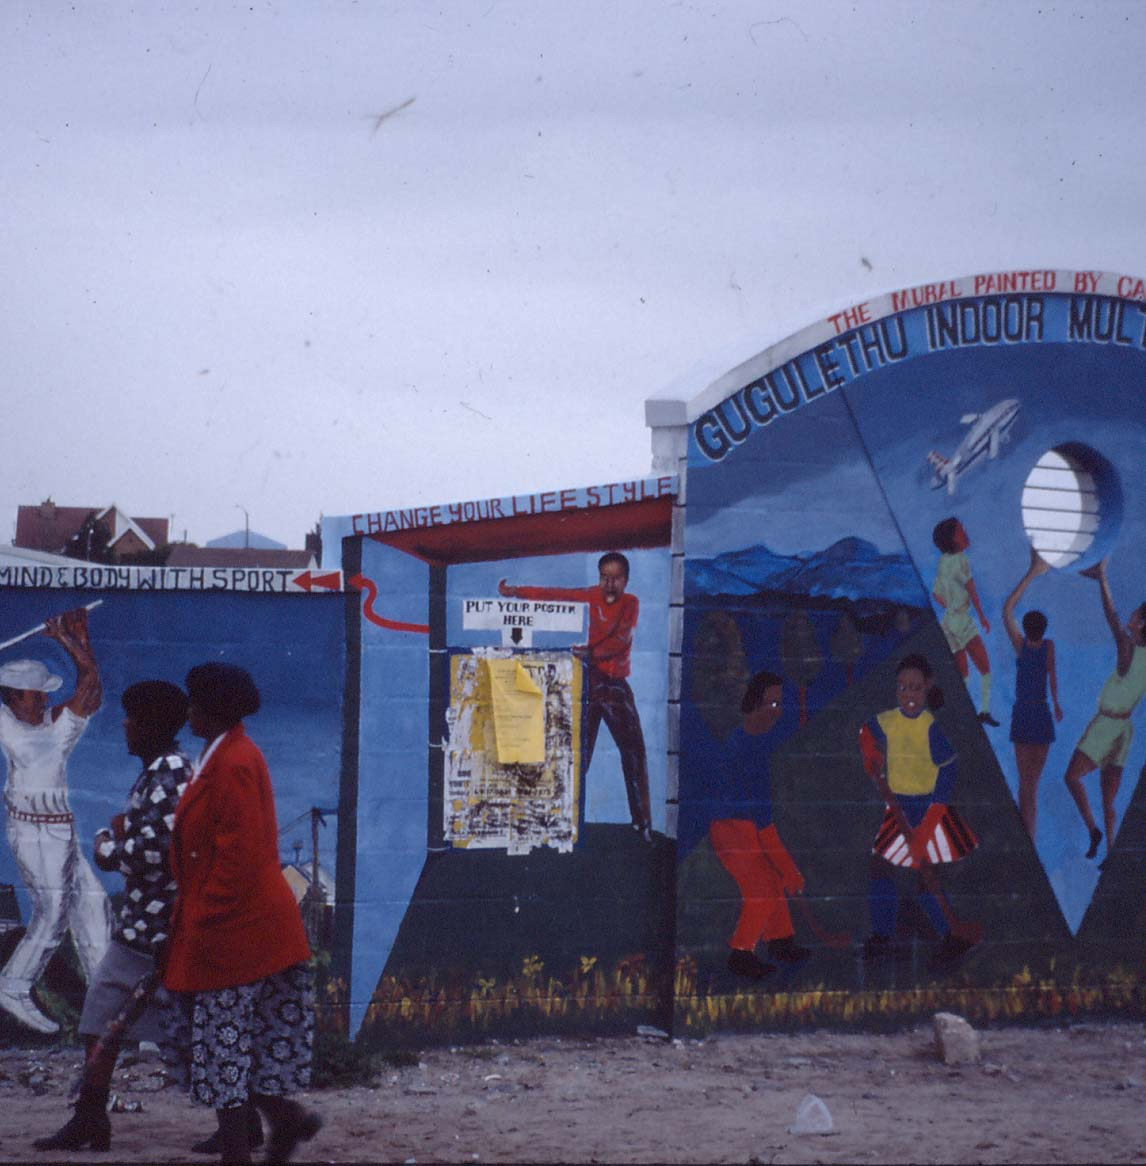 Khanya Mehlo, Liza Jacobs, Ernest Fulani and Shakes Tembani. Mural, Facilitators: Sipho Hlati and Tony Mhayi. Gugulethu Indoor Multisport Complex